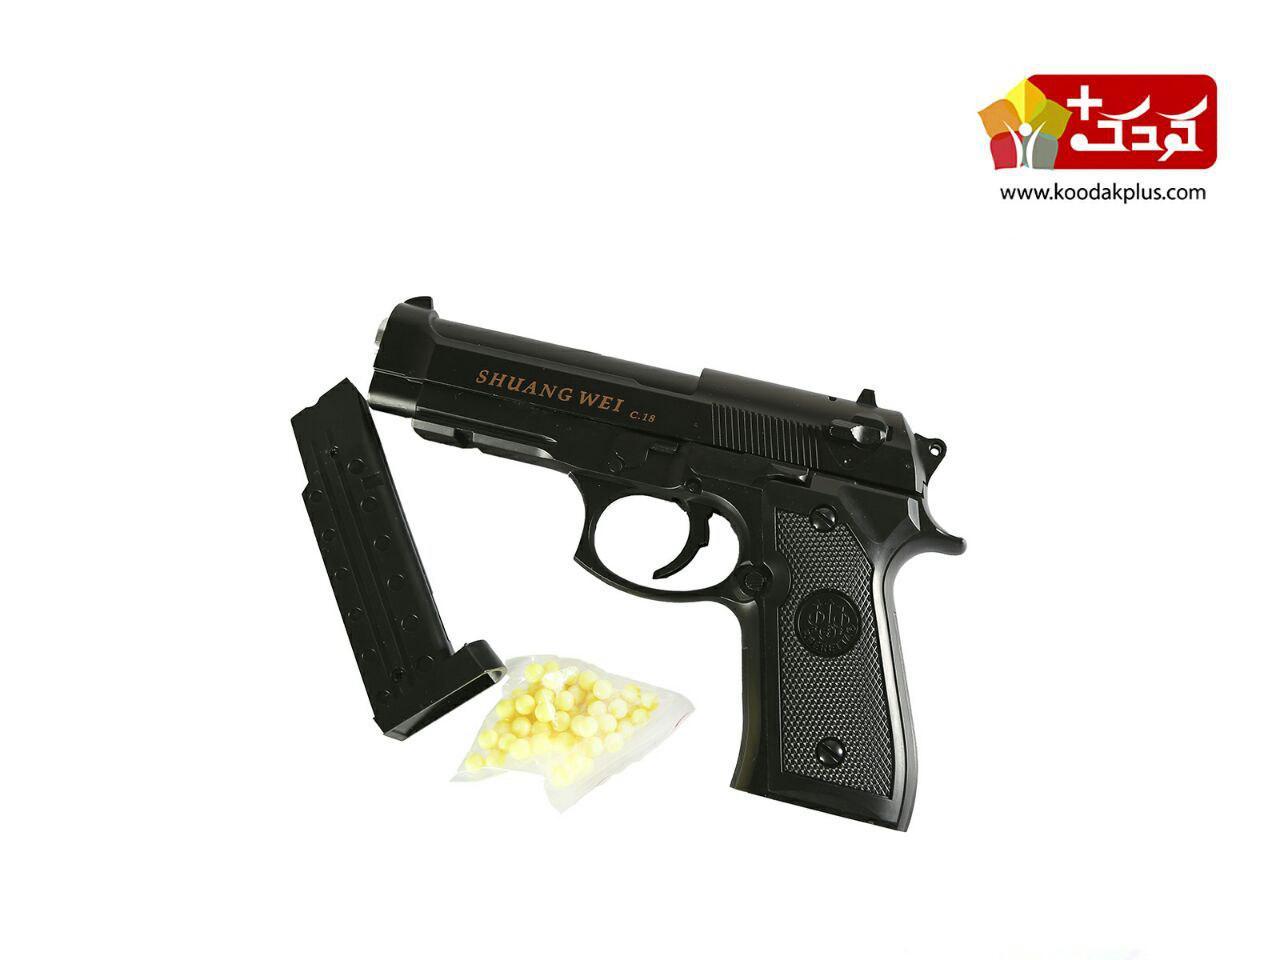 کلت ساچمه ای airsoft gun c18 کالیبر 6میلیمتر